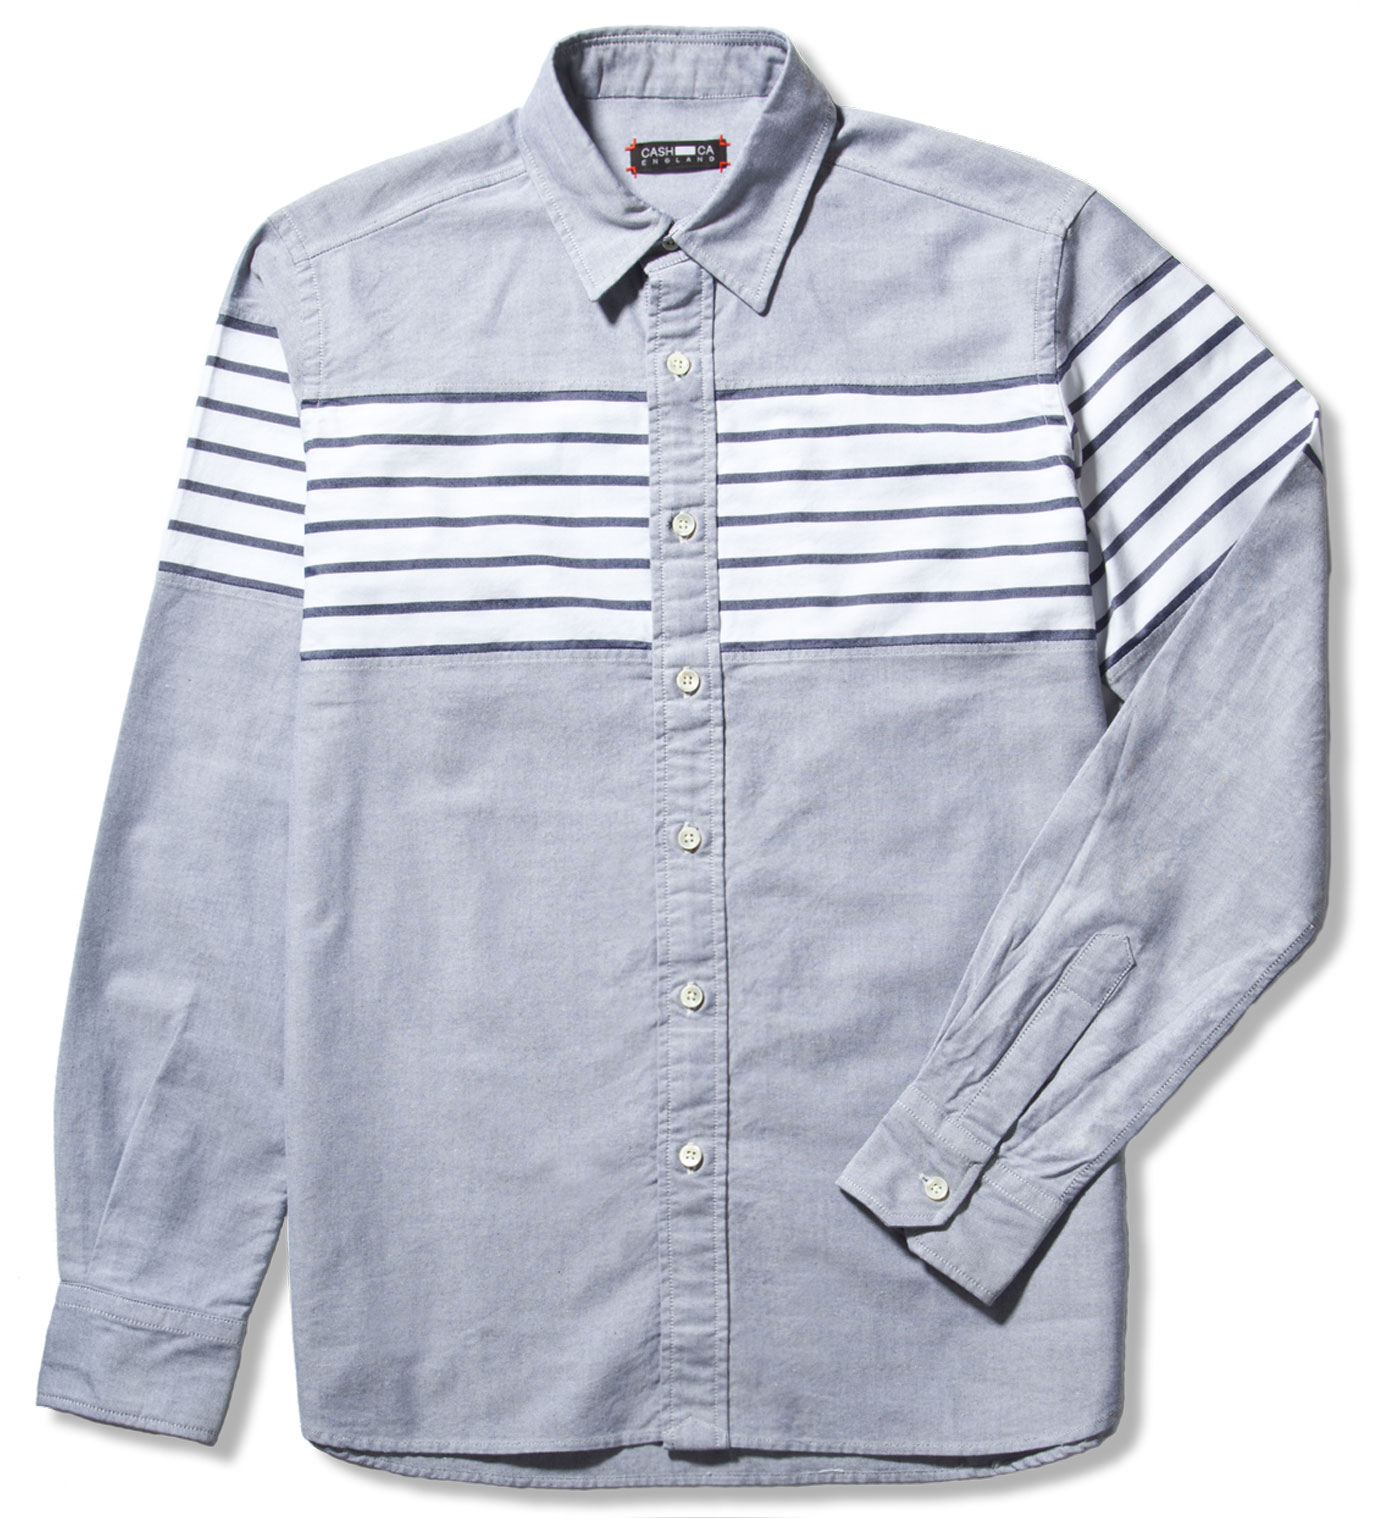 CASH CA Navy Chest Border Shirt